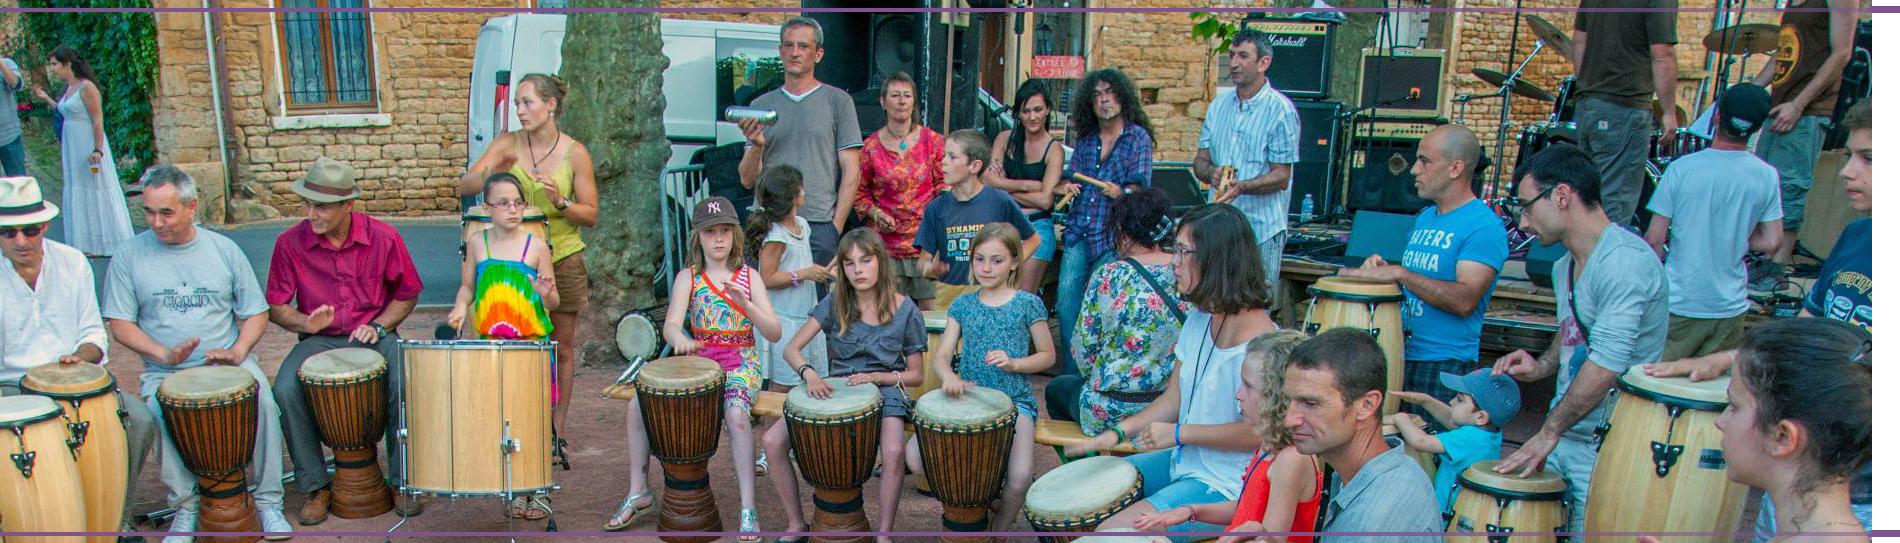 festival-drumcircle